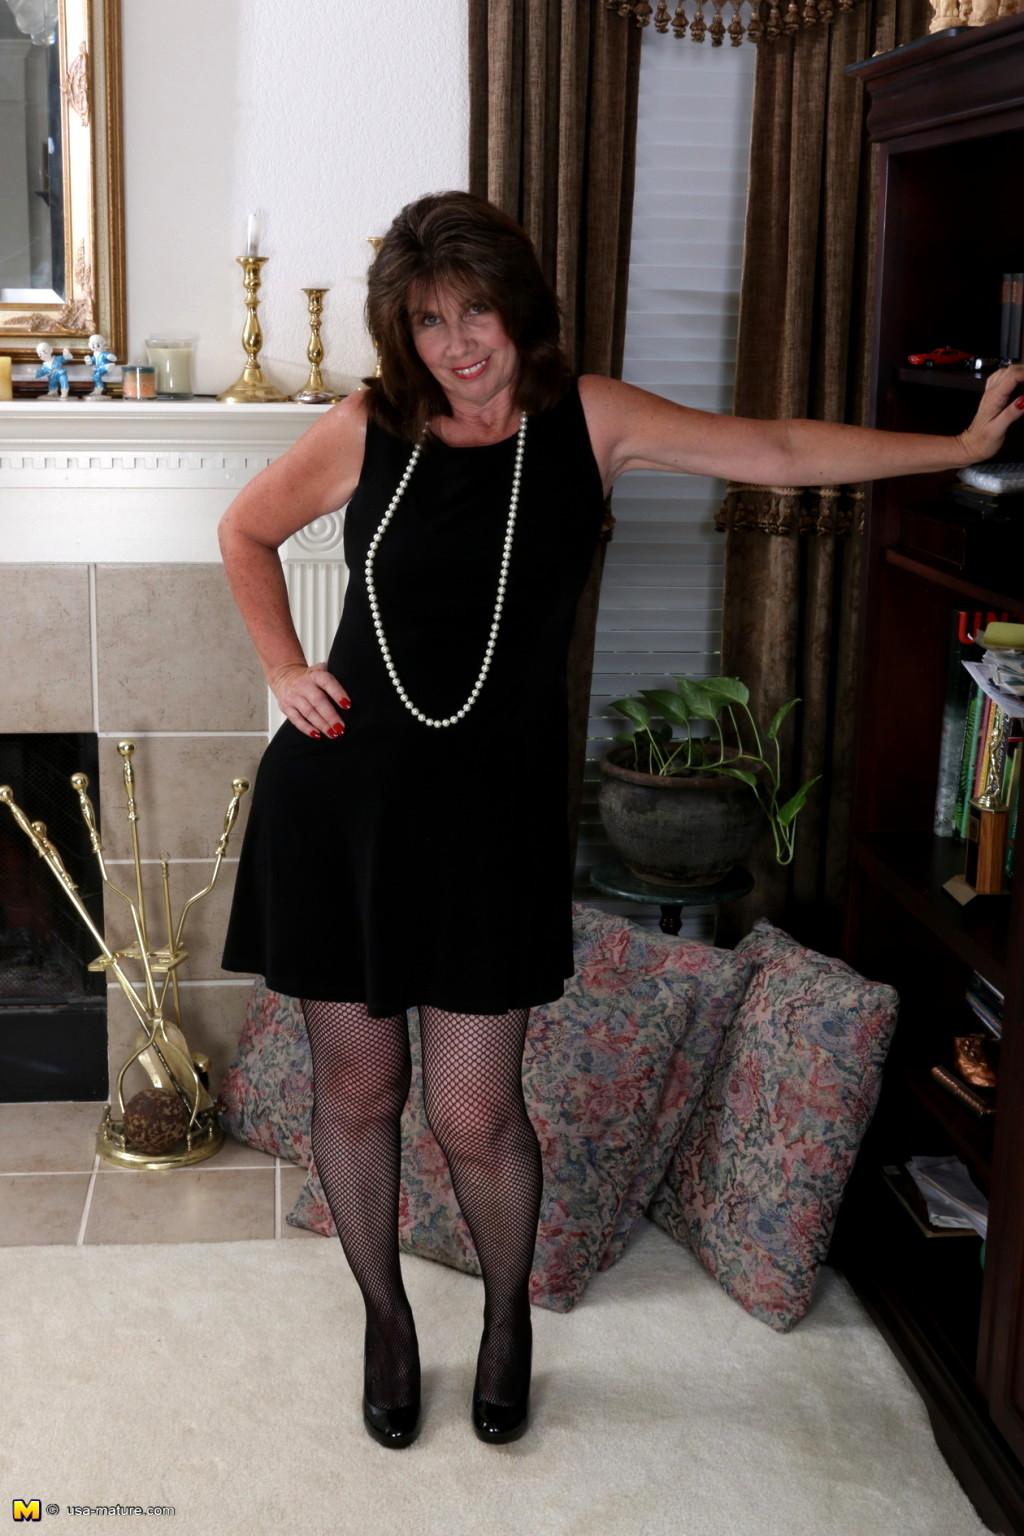 Babe Today Mature Nl Maturenl Model Royal Solo Porno